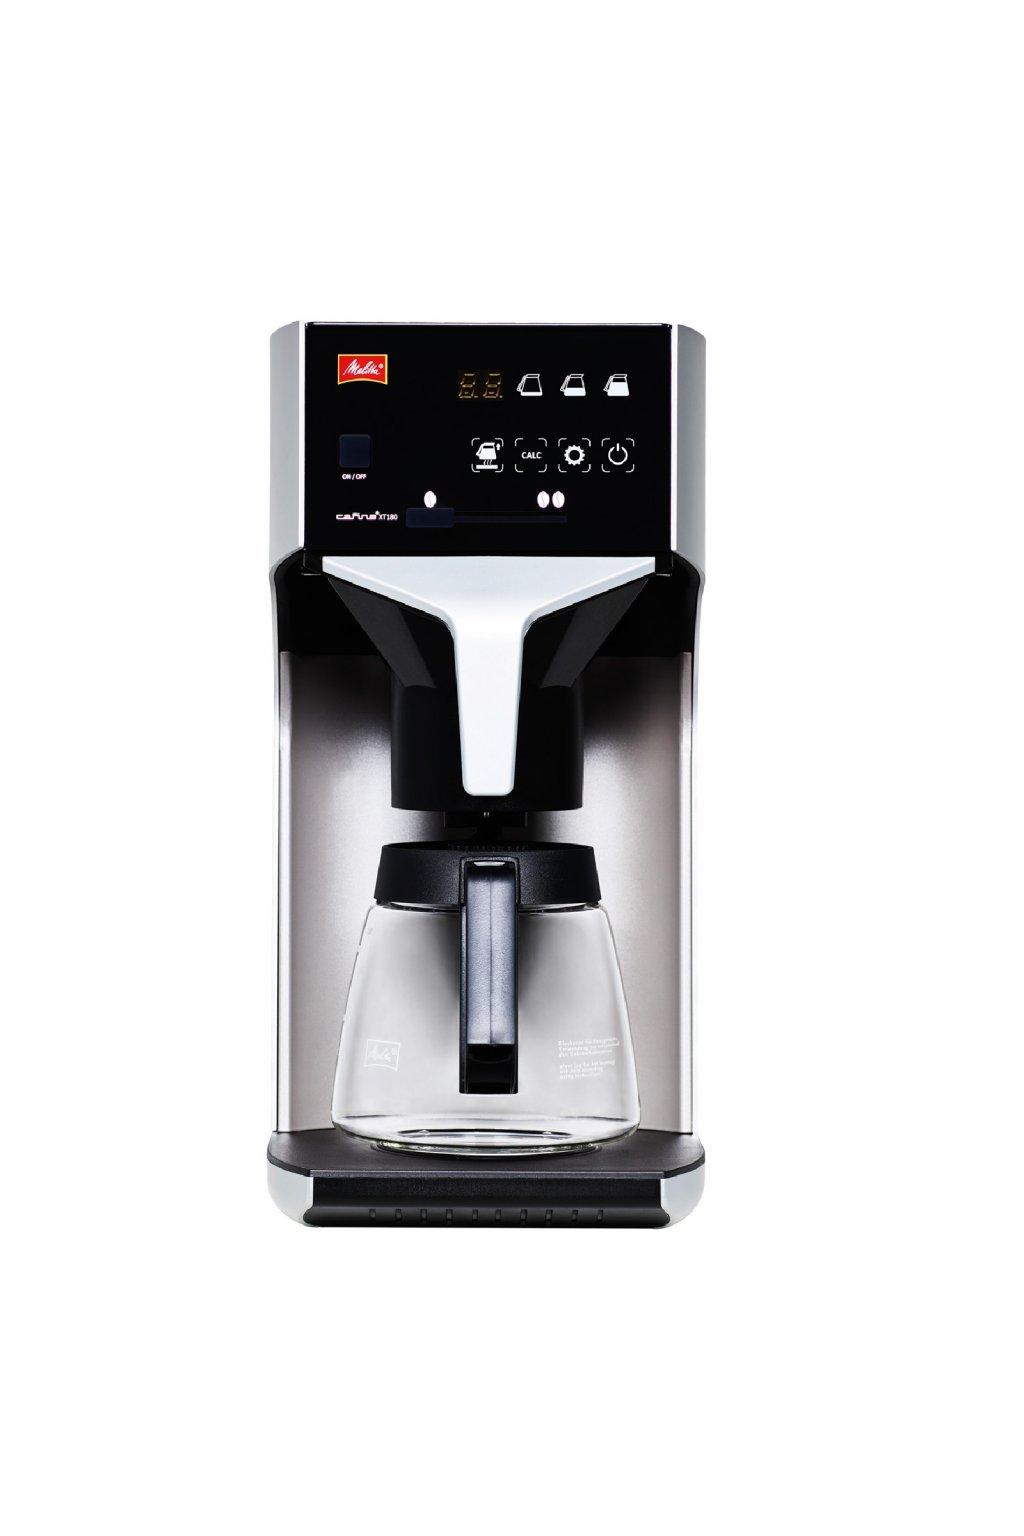 melitta kaffeemaschine XT 180 gwc v